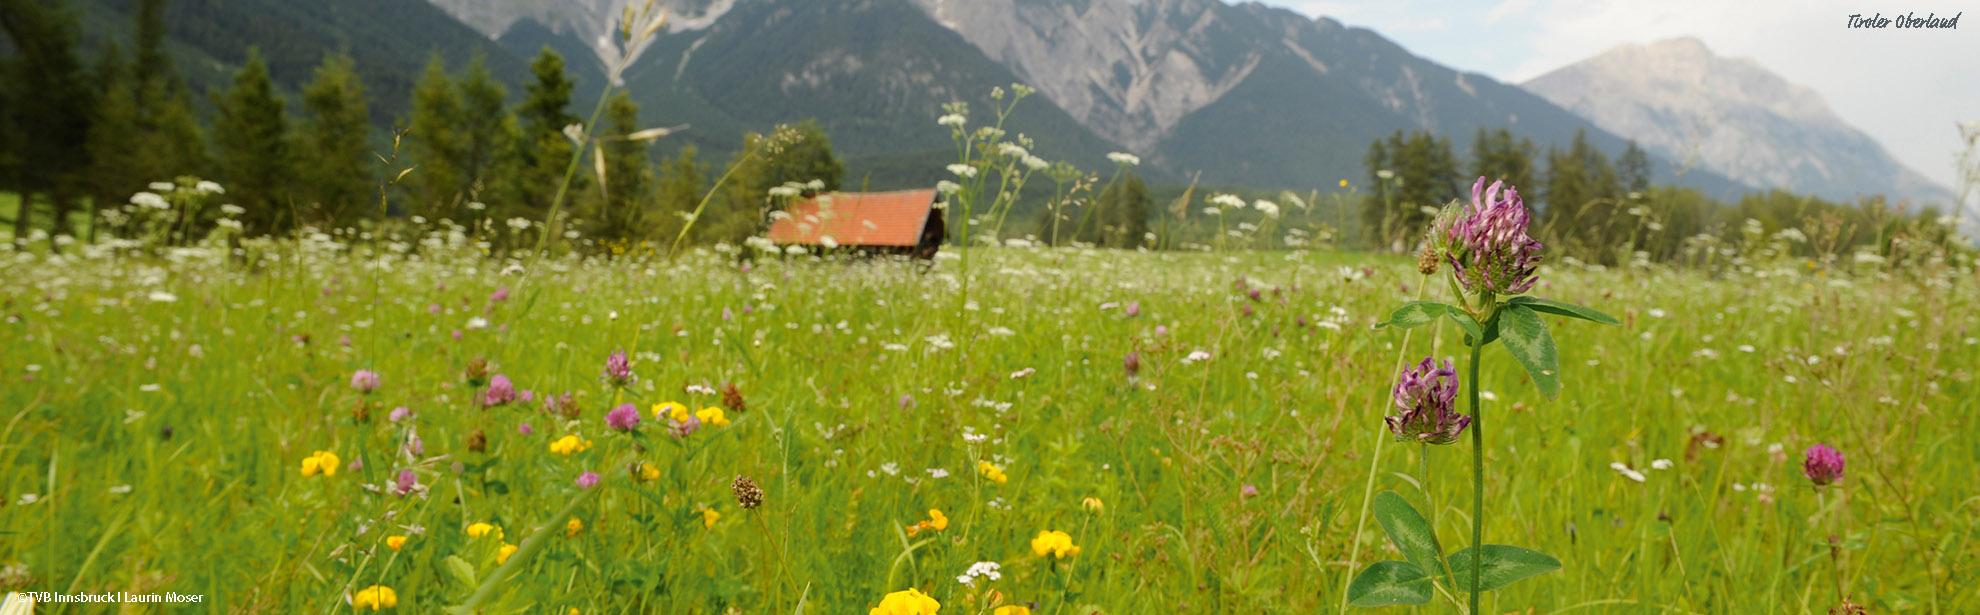 OTVB-Innsbruck_2011_872_Laurin-Moser_Tirol-Oberland